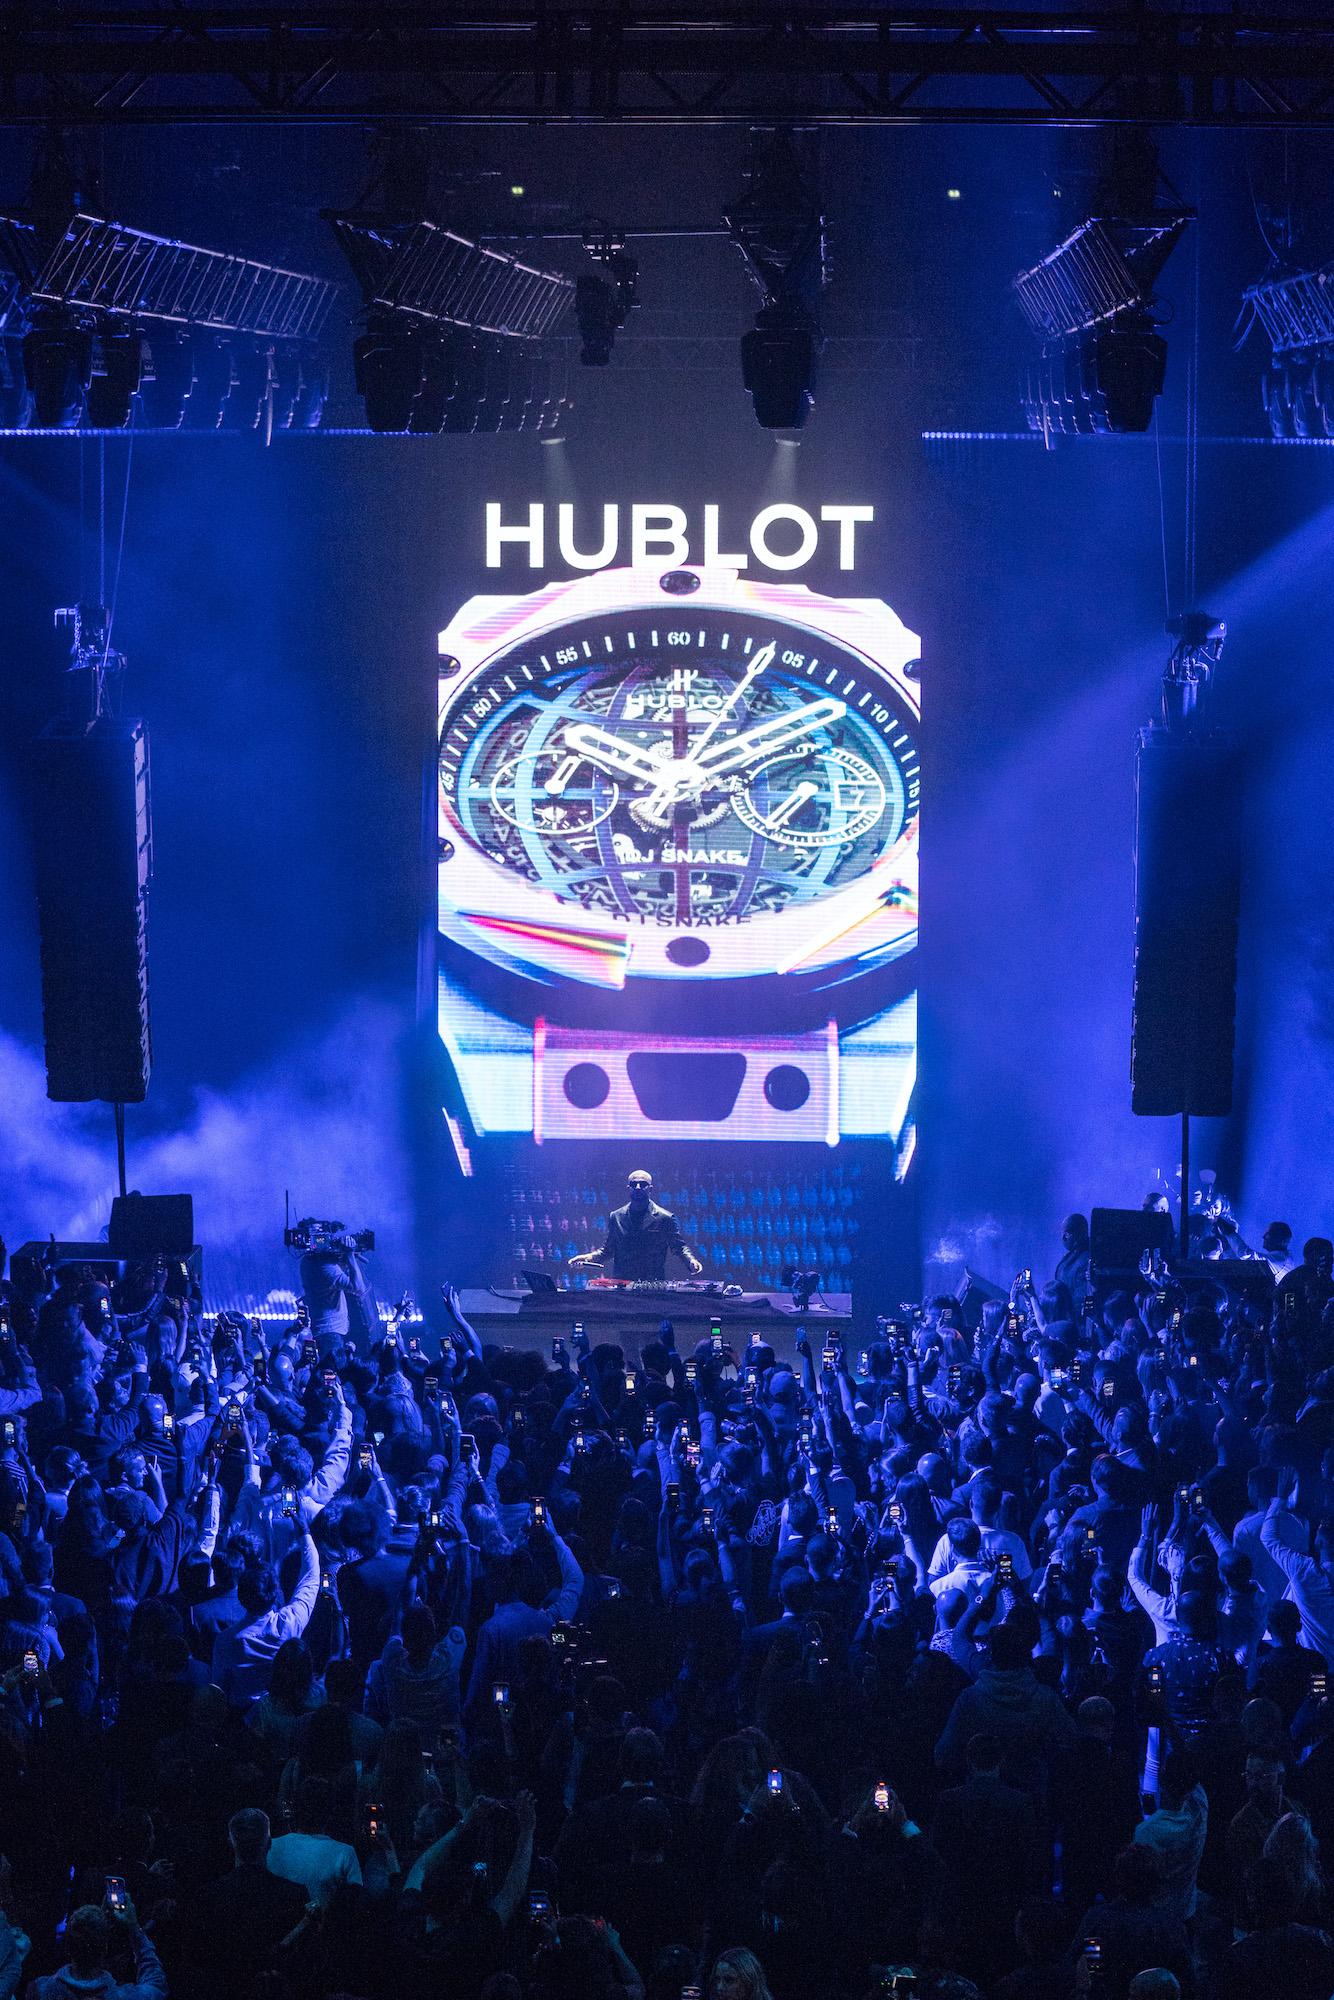 Hublot Big Bang DJ Snake Evento de lanzamiento